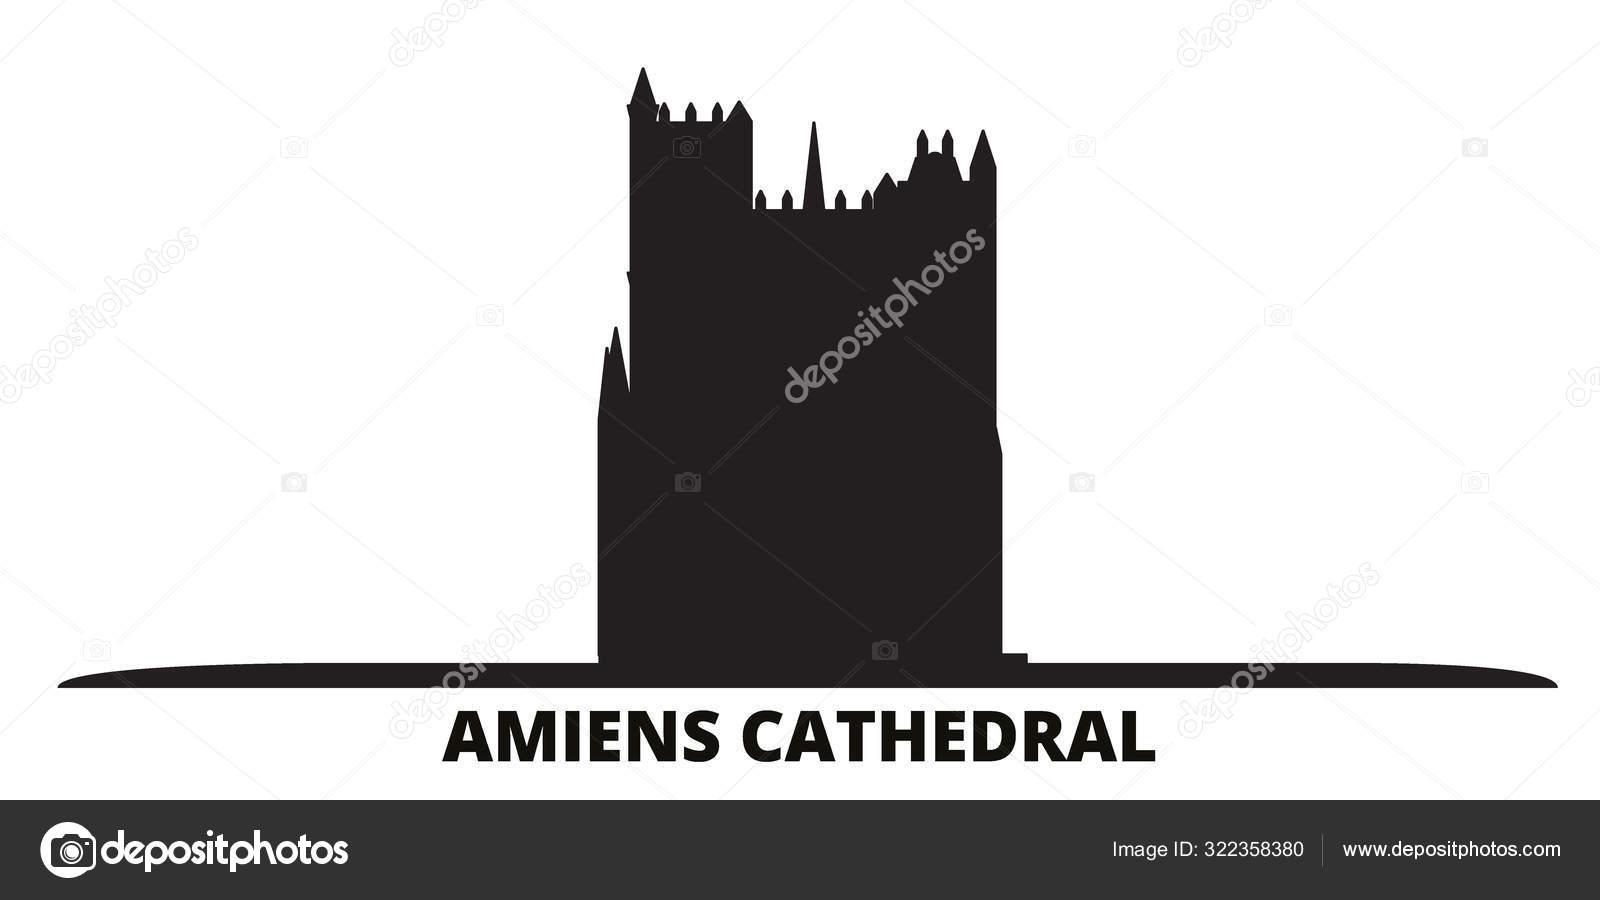 depositphotos stock illustration france amiens cathedral city skyline